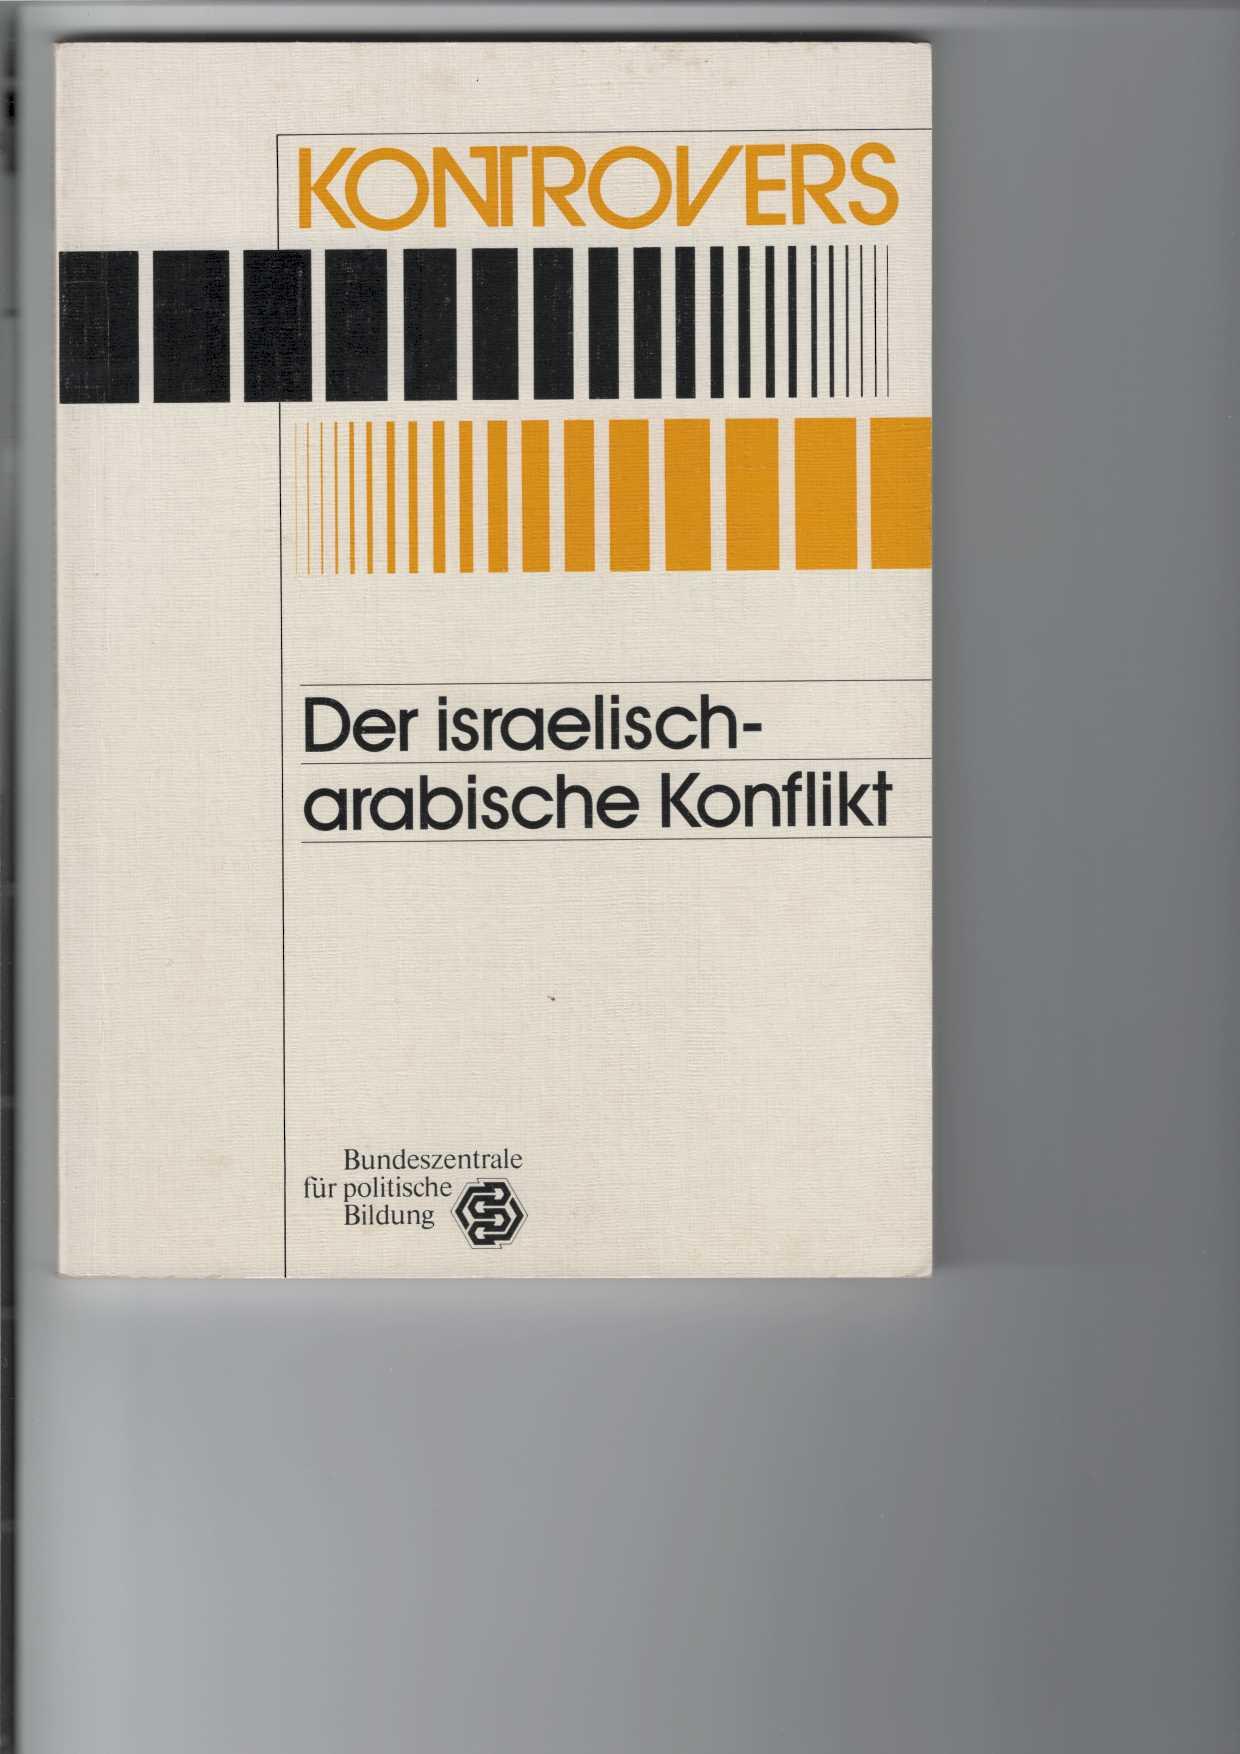 Tophoven, Rolf: Der israelisch-arabische Konflikt. Reihe: